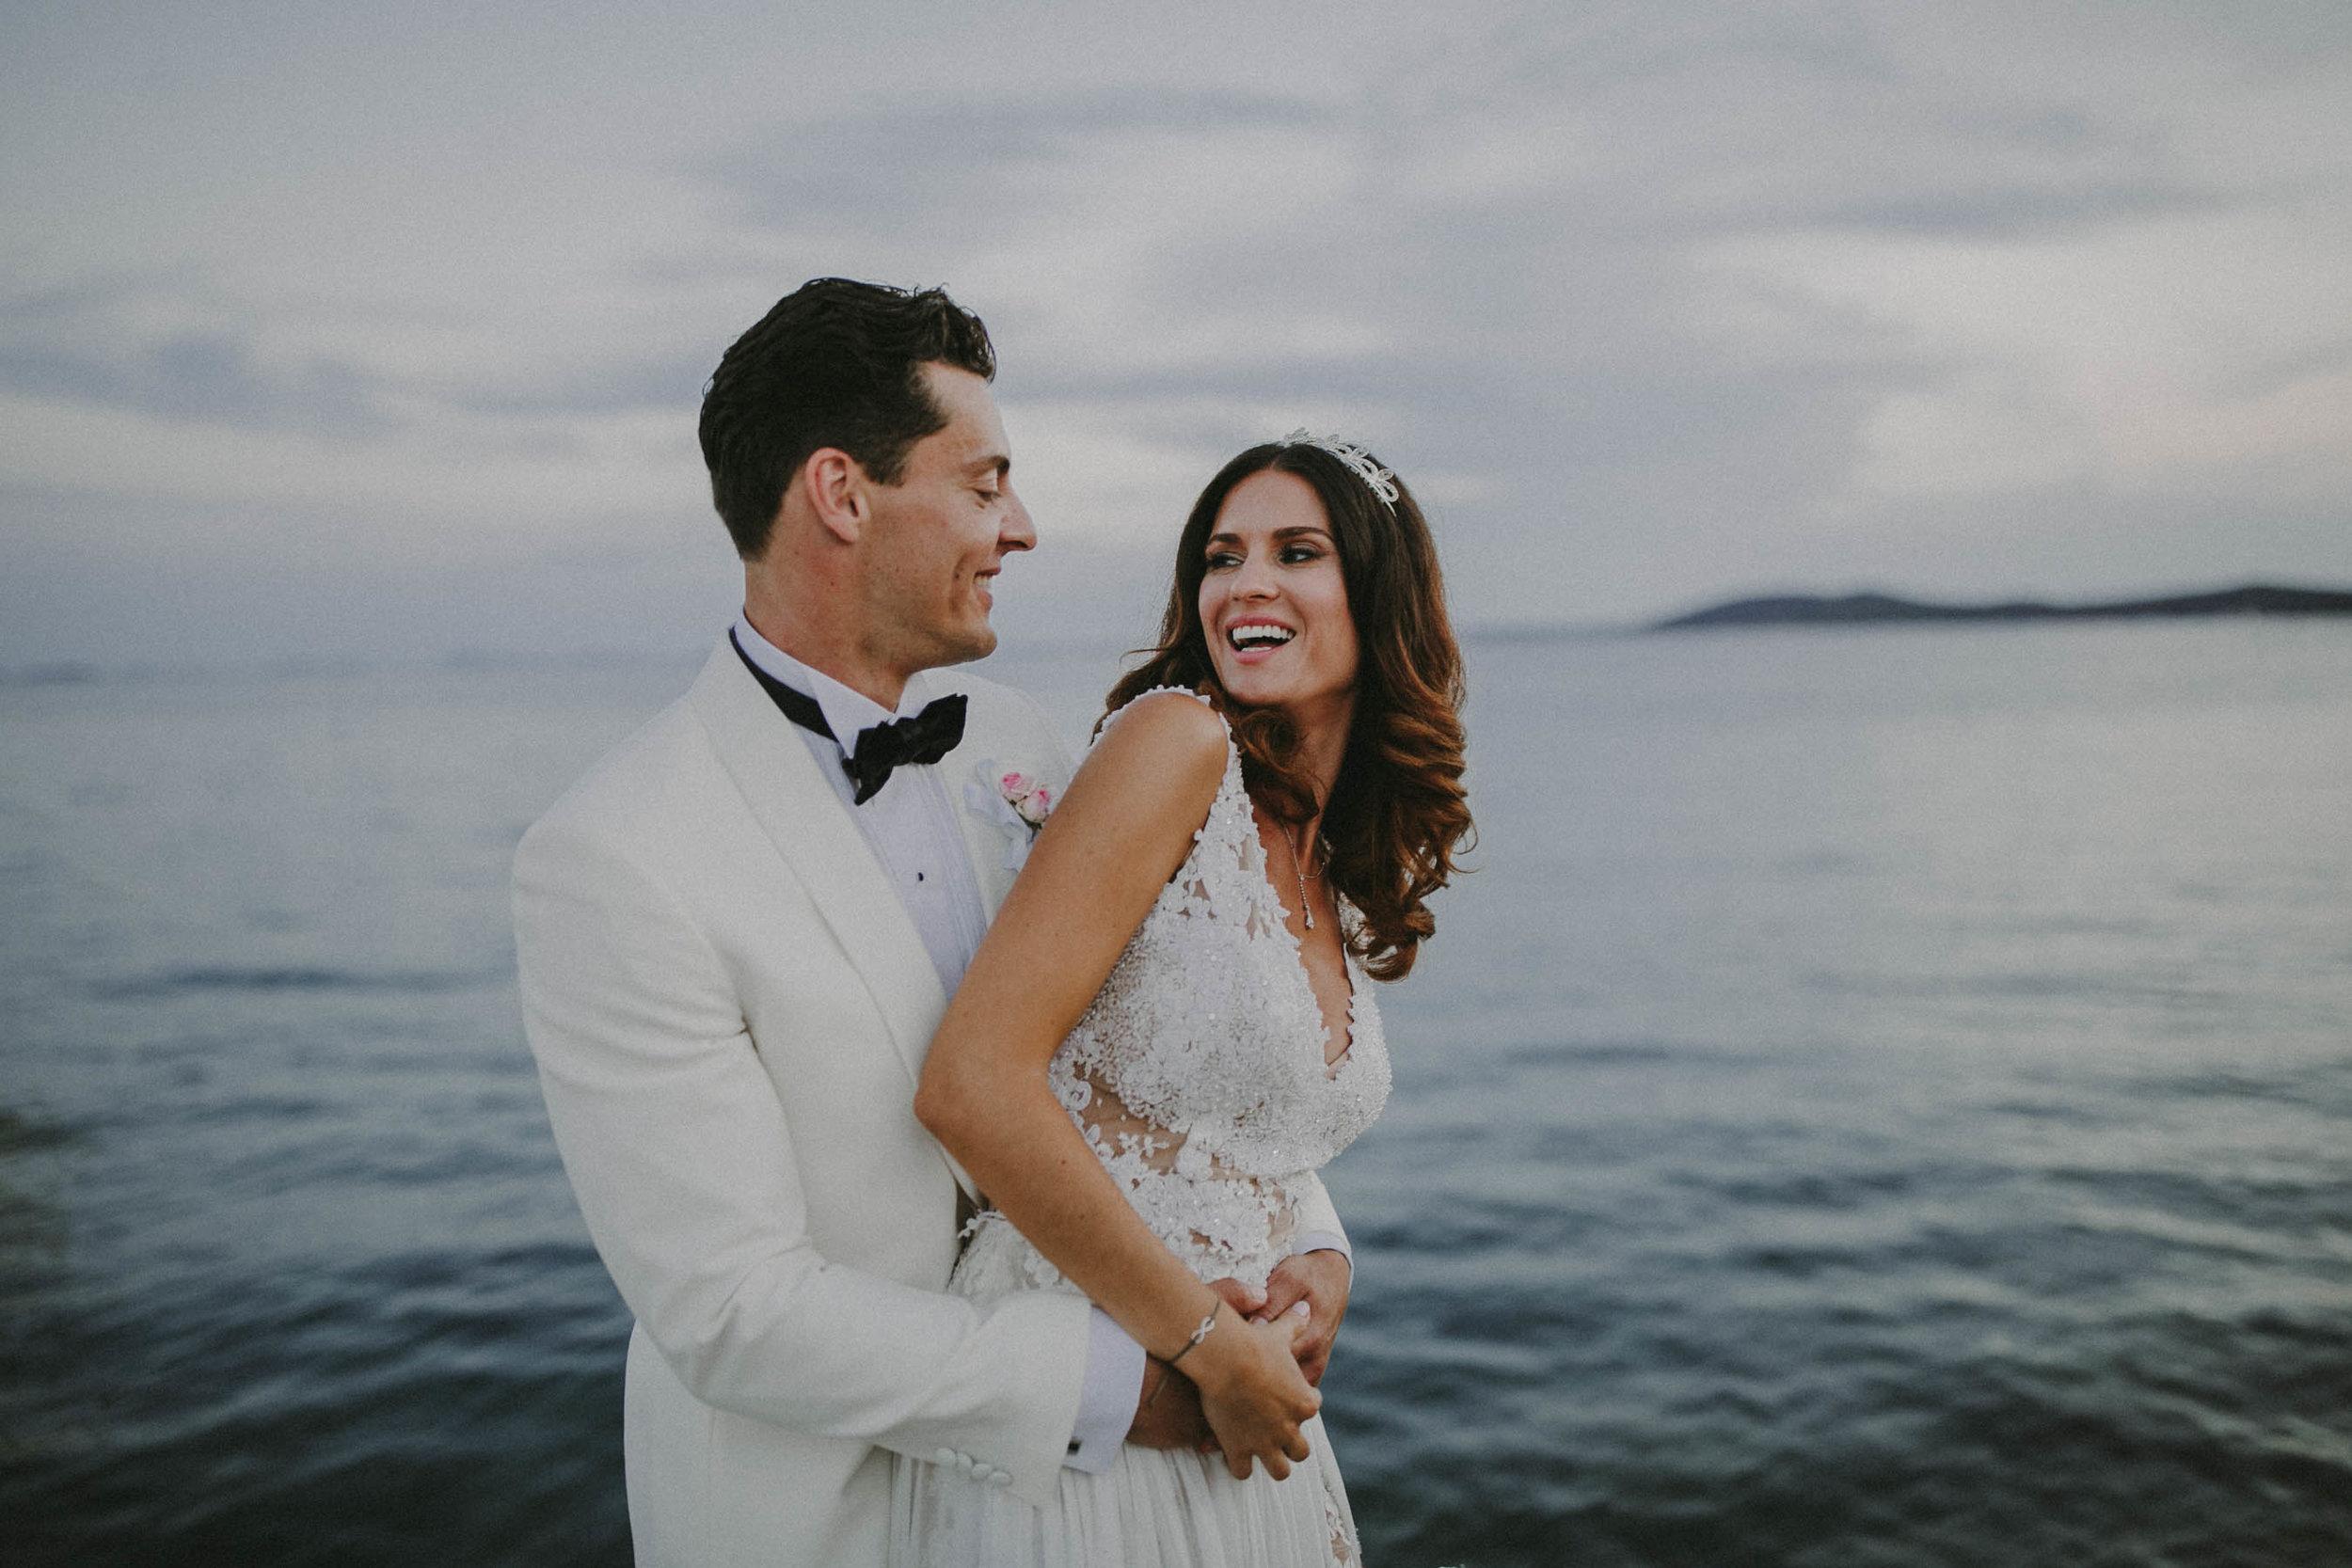 sylvia&dimitri-Wedding-Crvena_Luka-Croatia-83().jpg